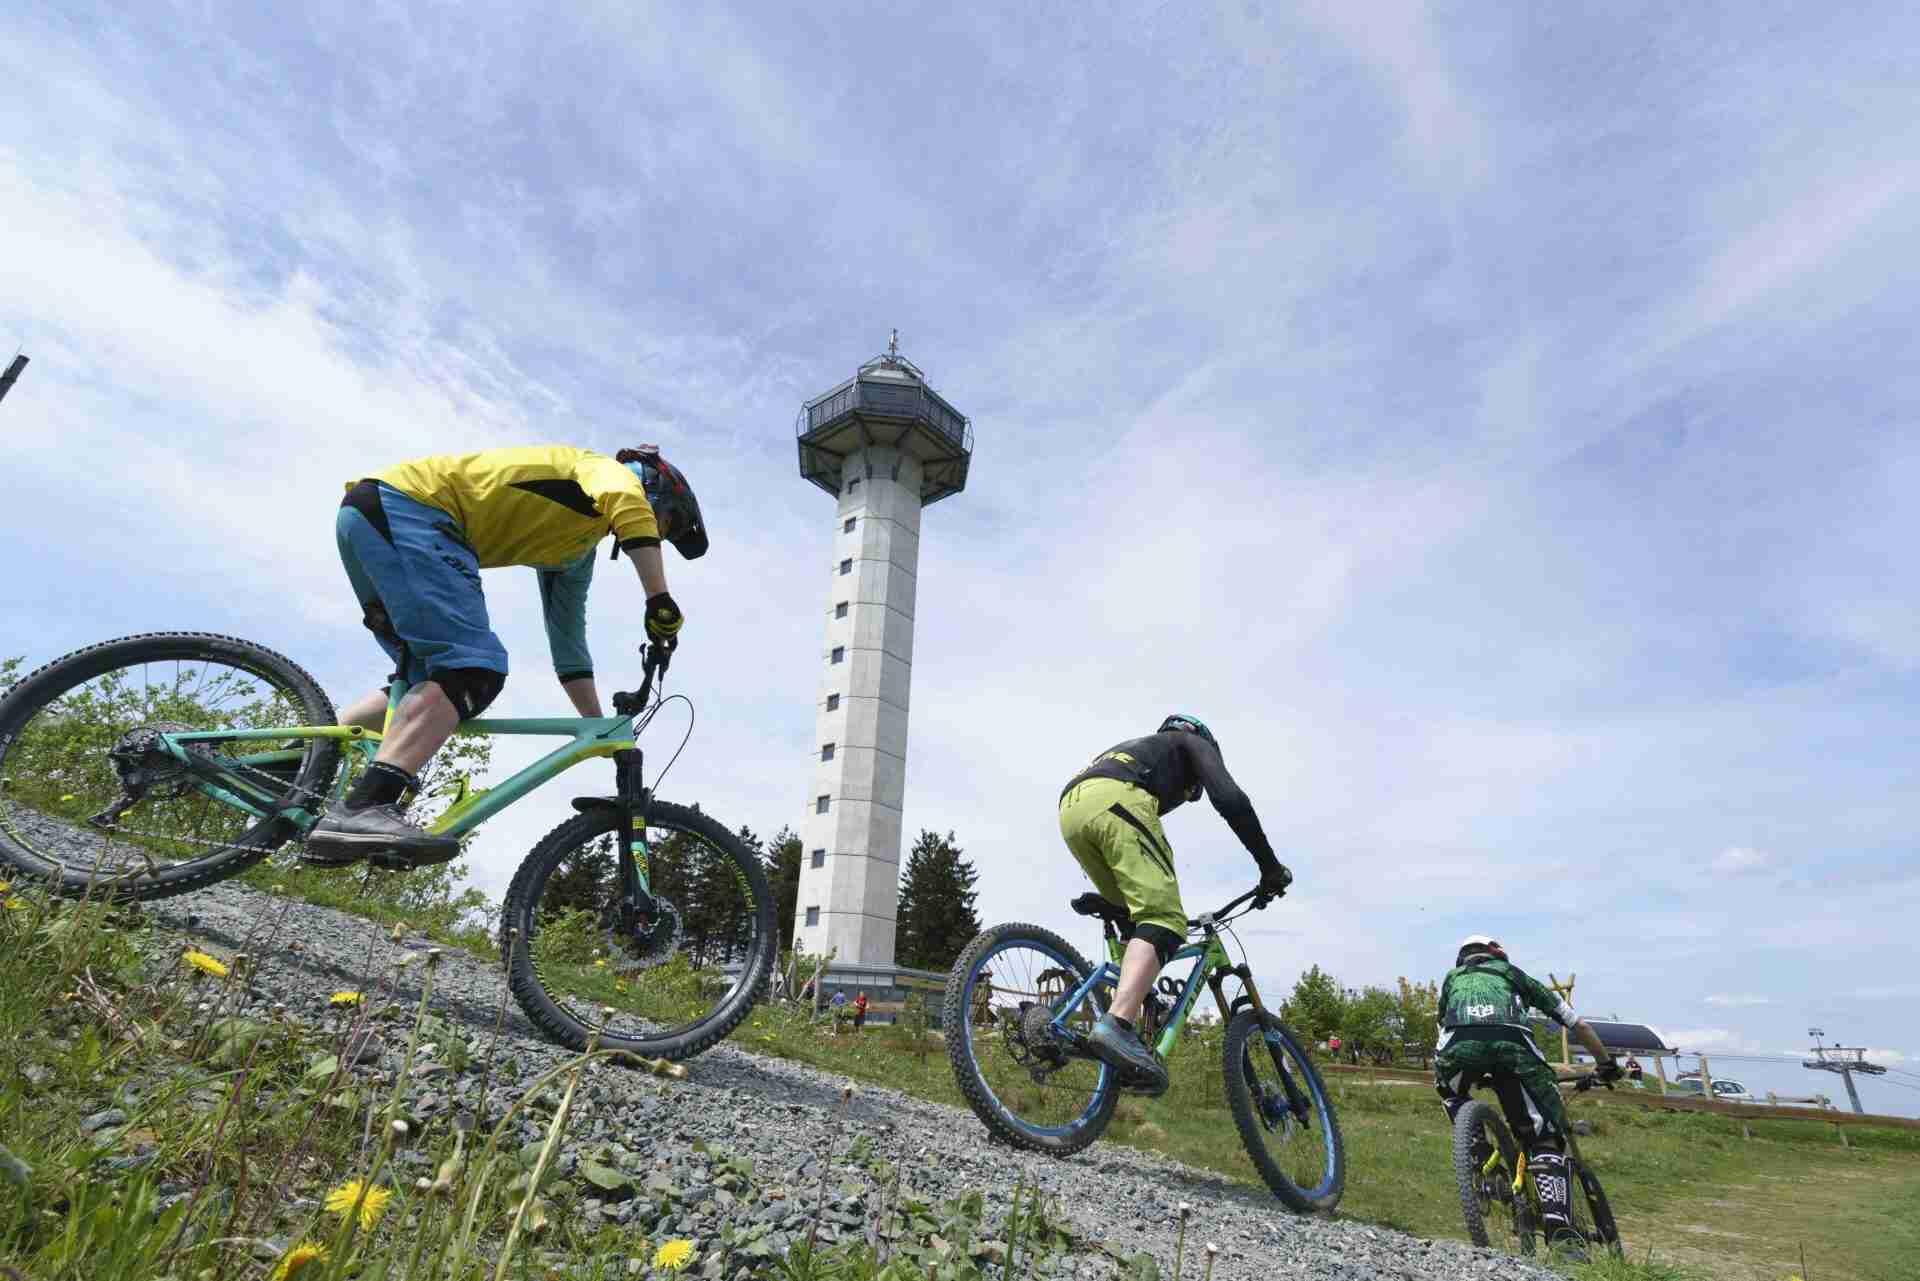 touristinfo-willingen-mountainbiker-hochheideturm-e1551114575520.jpg